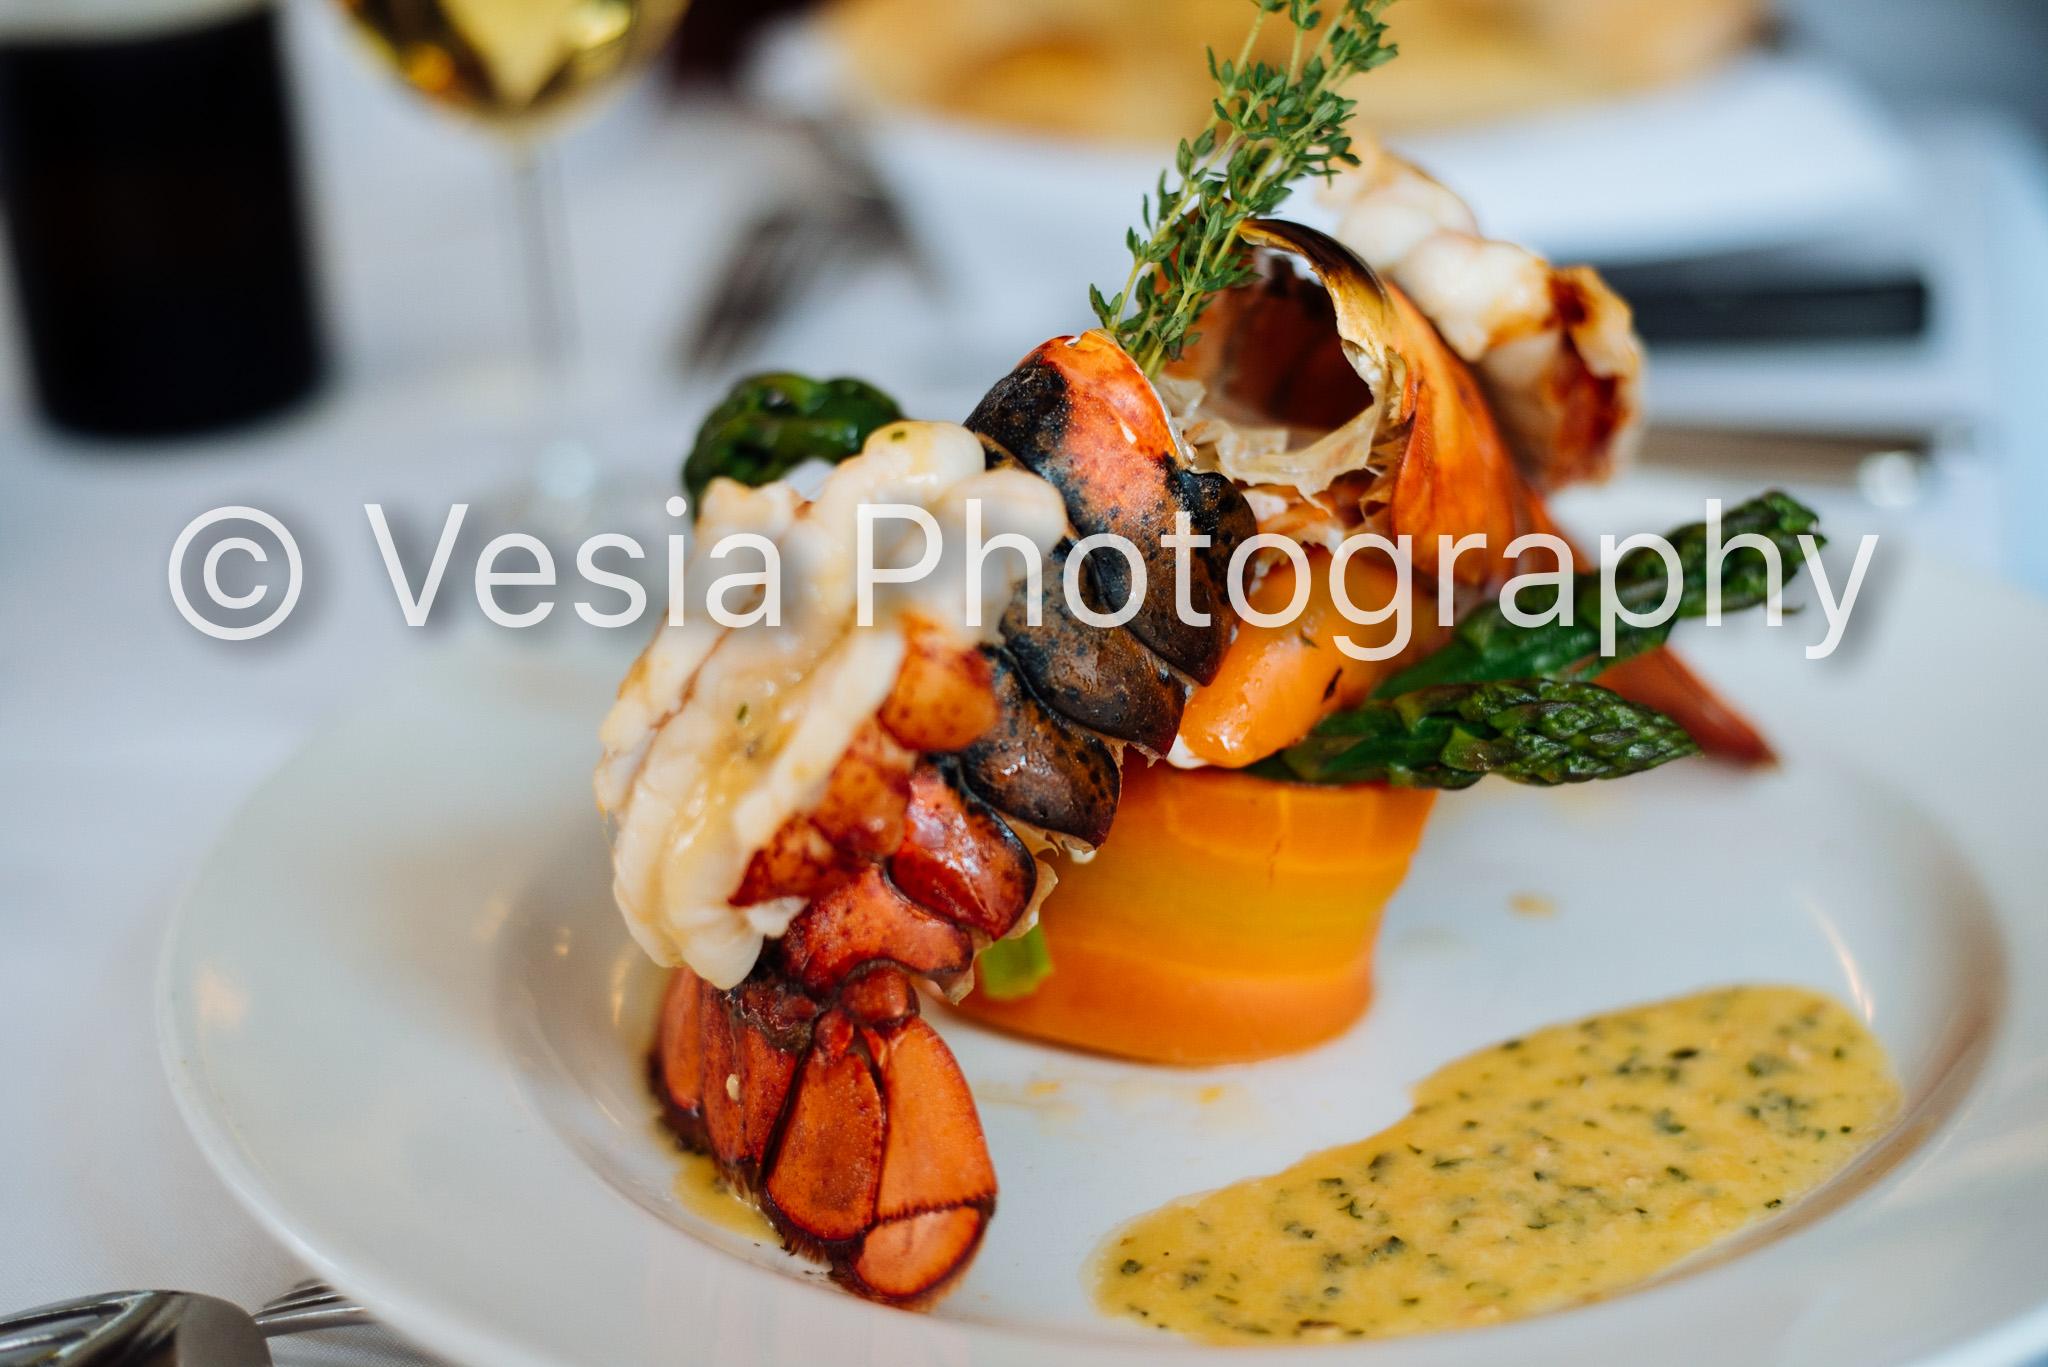 Campari_Centro_Food_Proofs-15.jpg